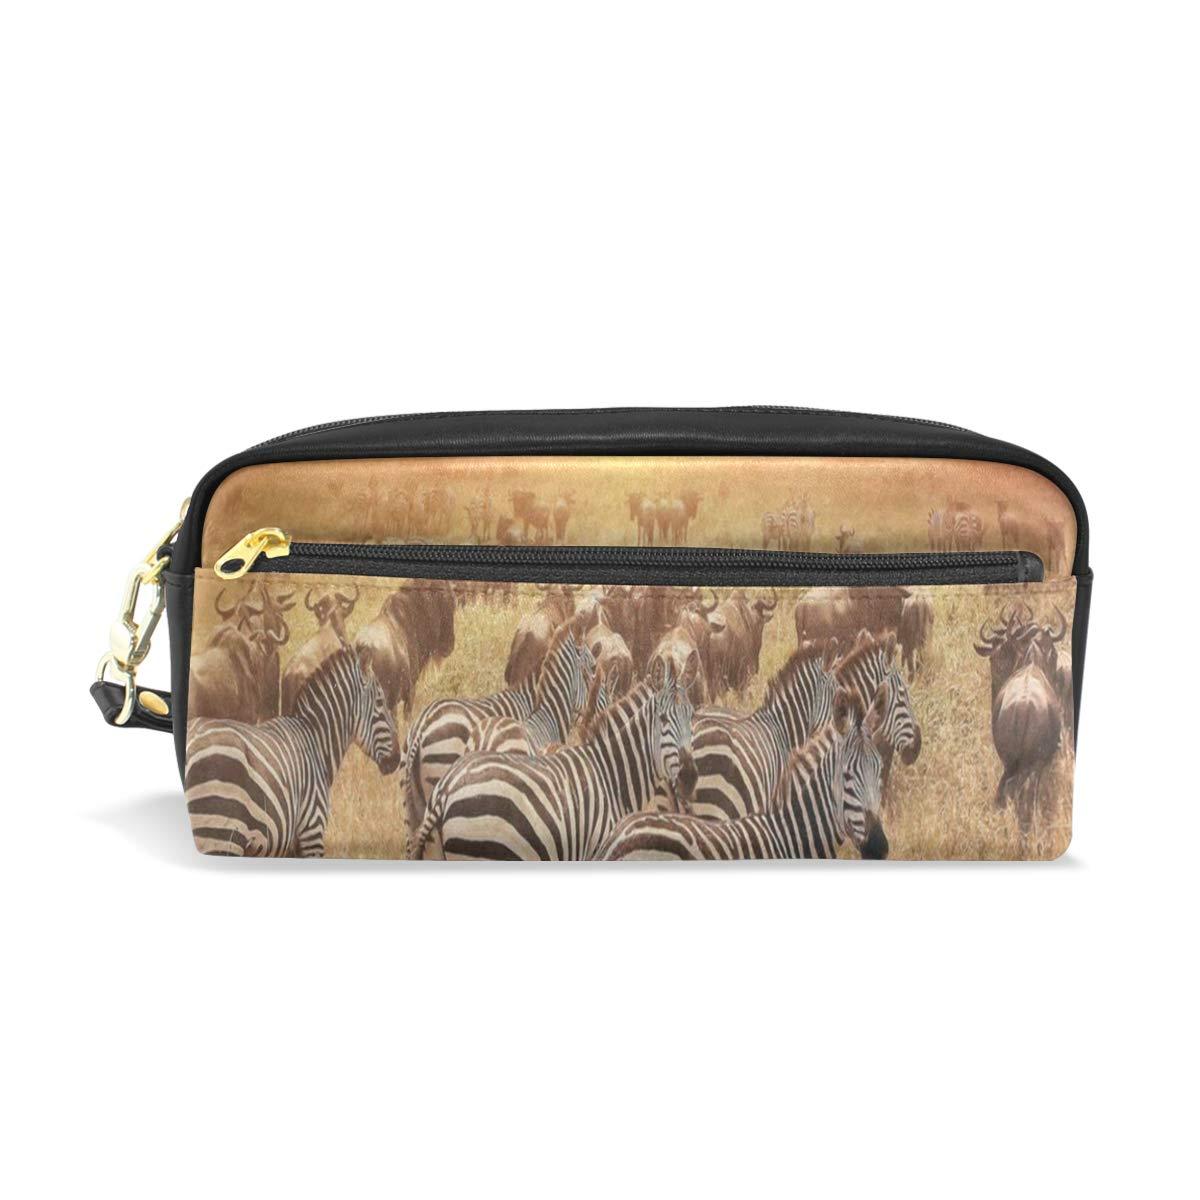 Pen Case Animal Zebra Sunset Fall Grass Pencil Pouch Makeup Cosmetic Travel School Bag